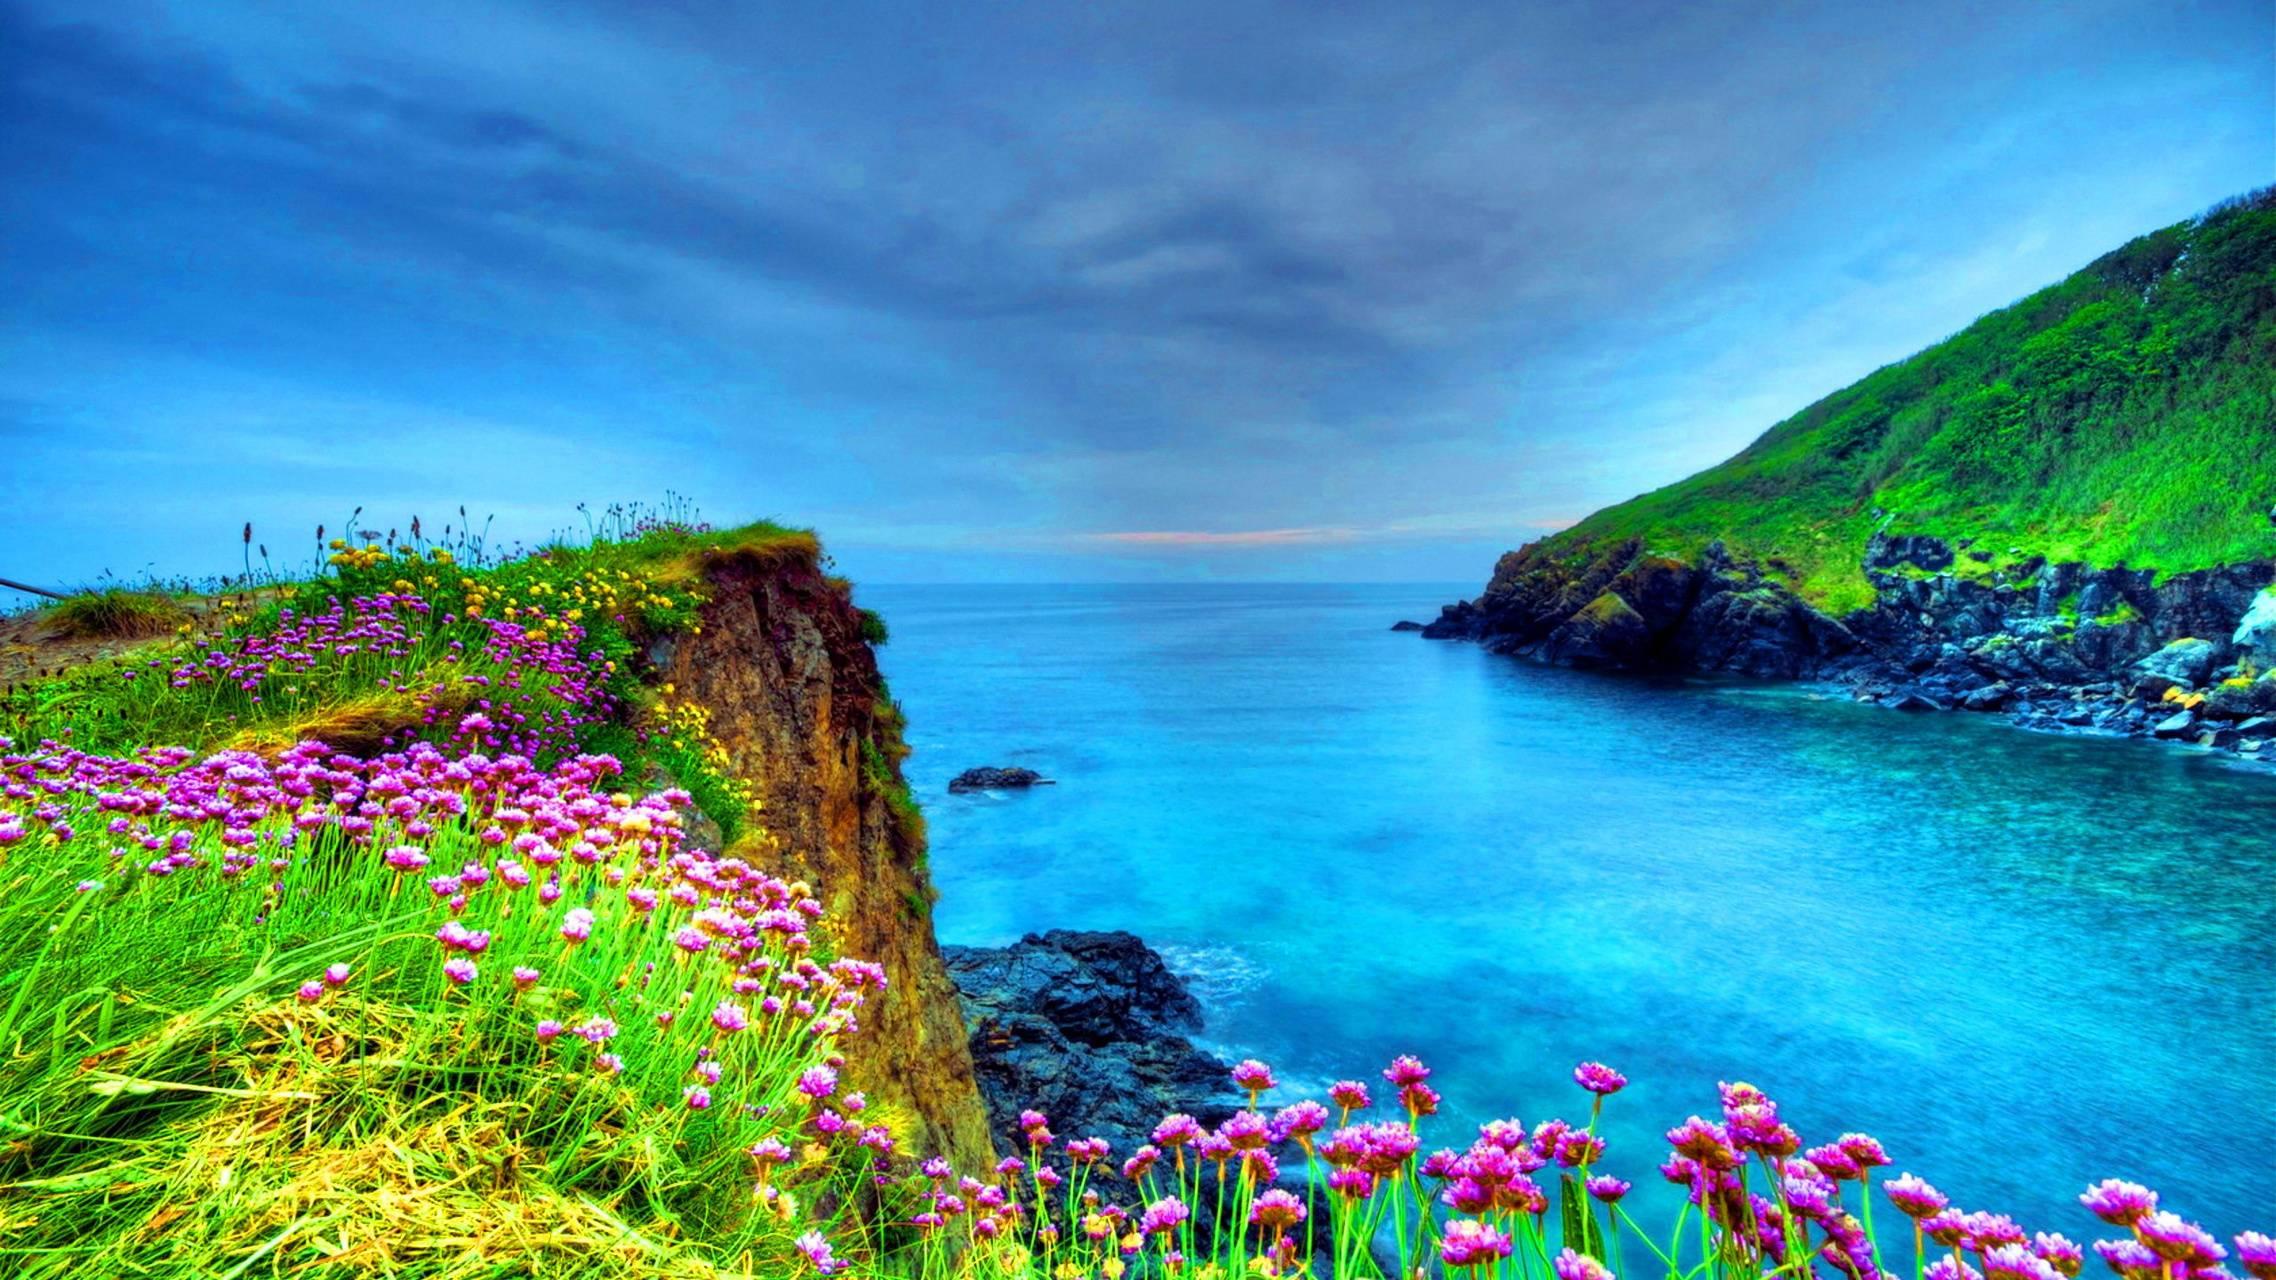 Sea view flowers